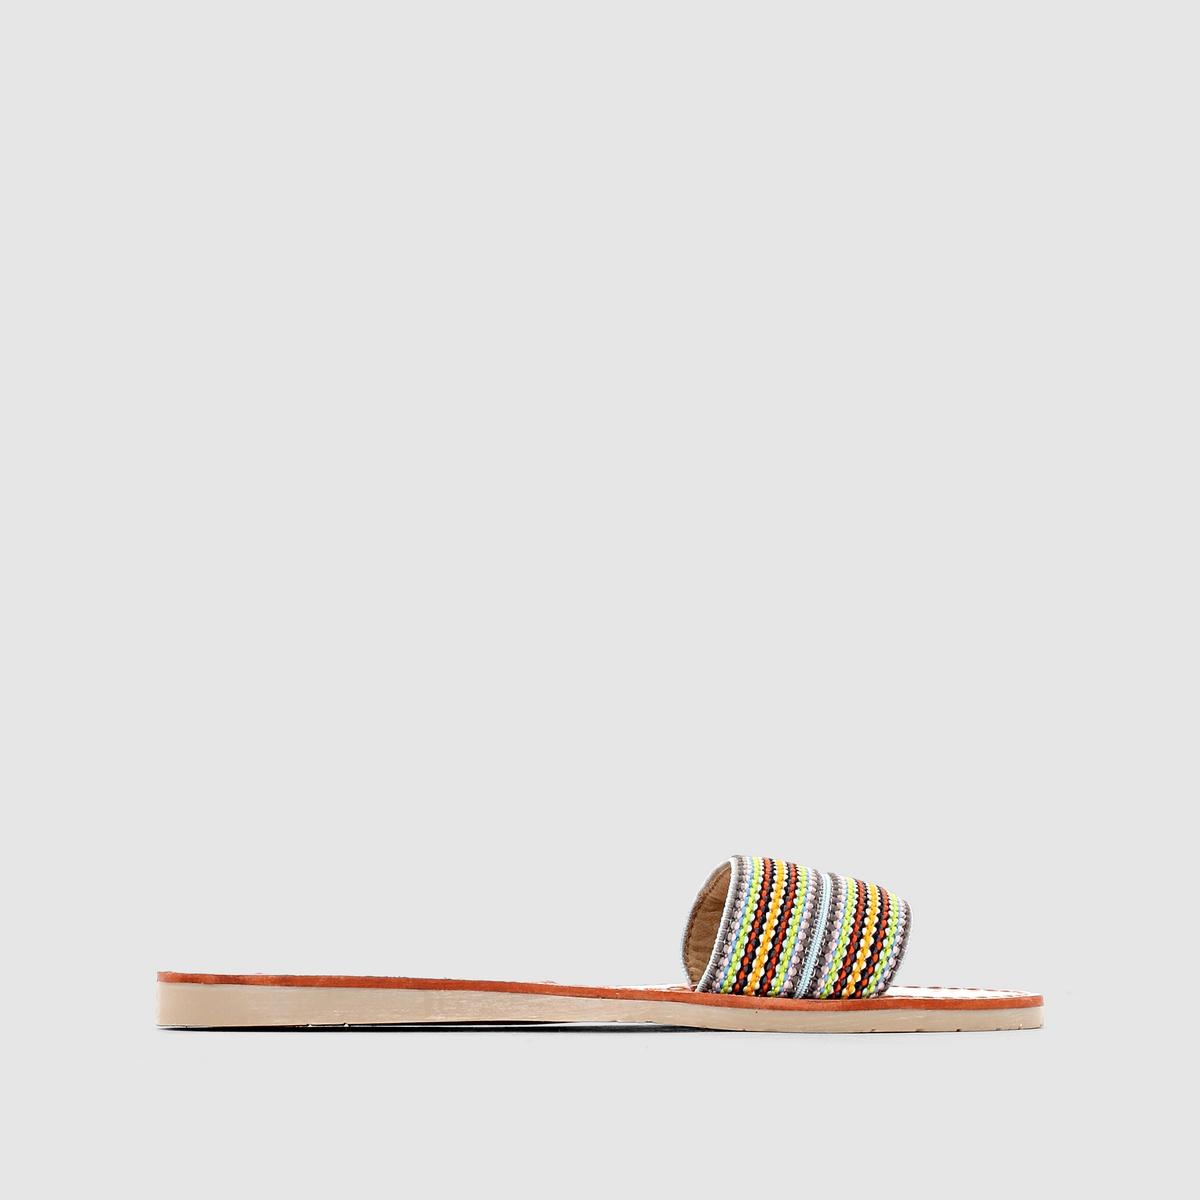 Шлёпанцы из текстиля, MELINAДаже самые простые шлёпанцы становятся ультрамодными, когда за дело берётся Coolway  !<br><br>Цвет: разноцветный<br>Размер: 36